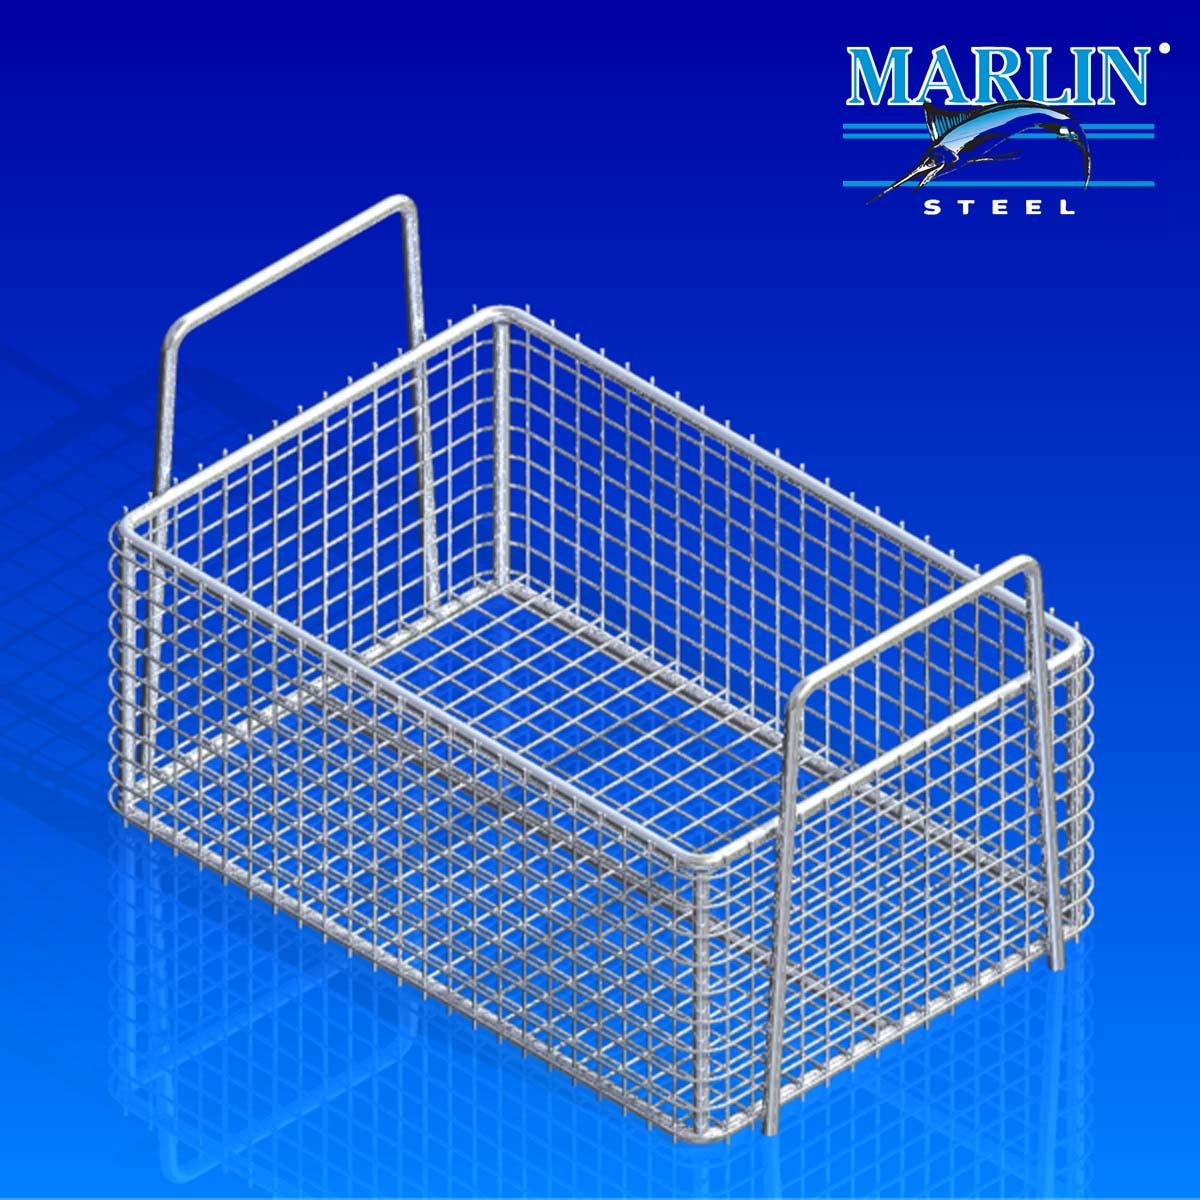 Marlin Steel Basket with Handles 725001